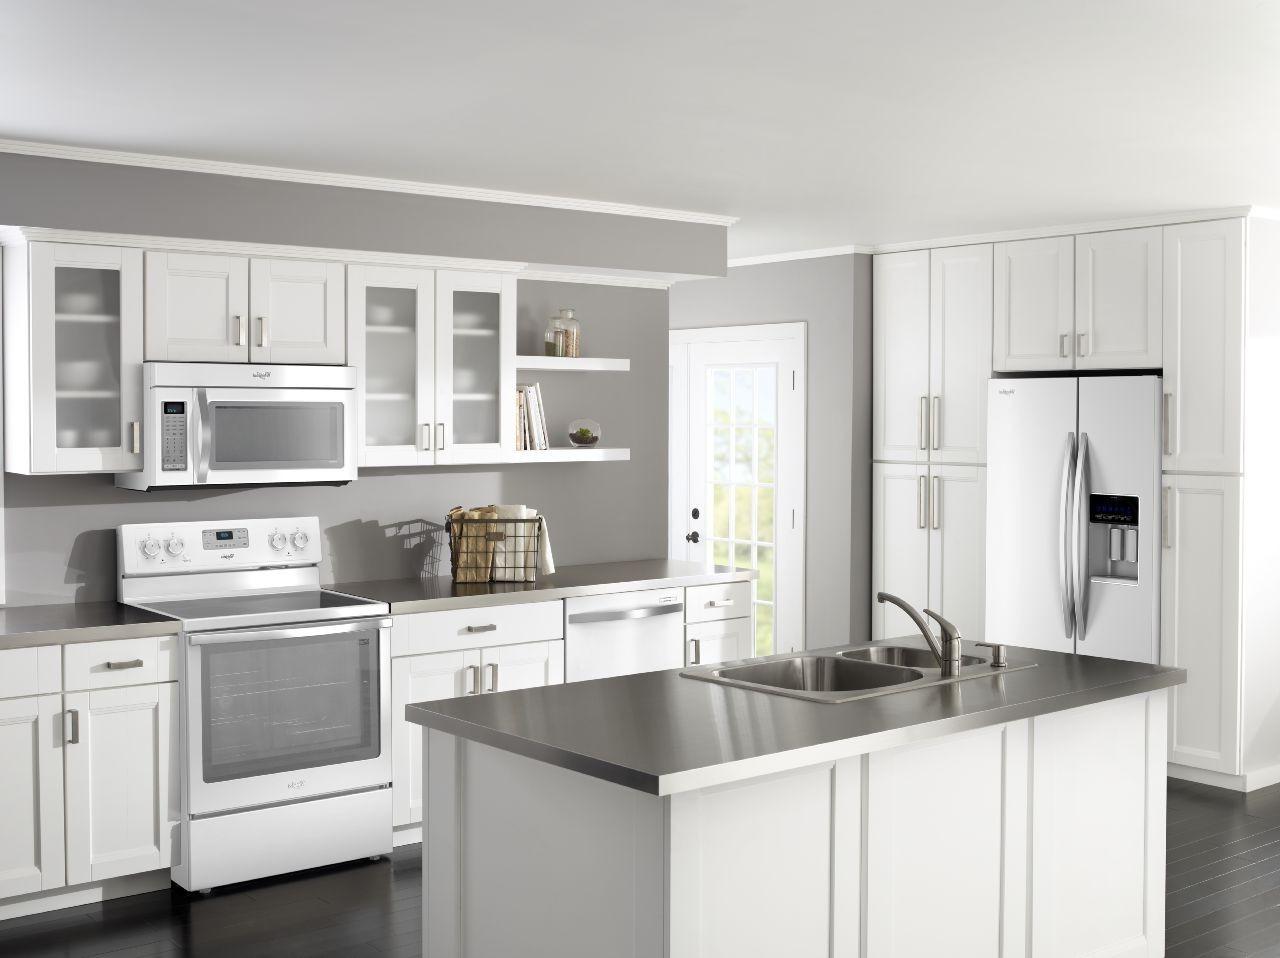 kitchen cabinet ideas with white appliances photo - 3